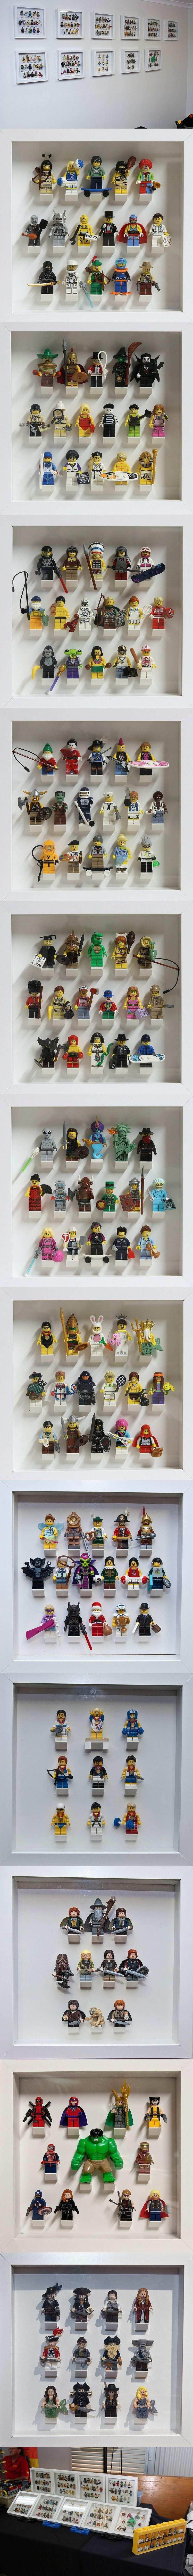 Pin Von David Recklinghausen Auf Lego Lego Lego Lego Display Cooles Lego Ikea Ribba